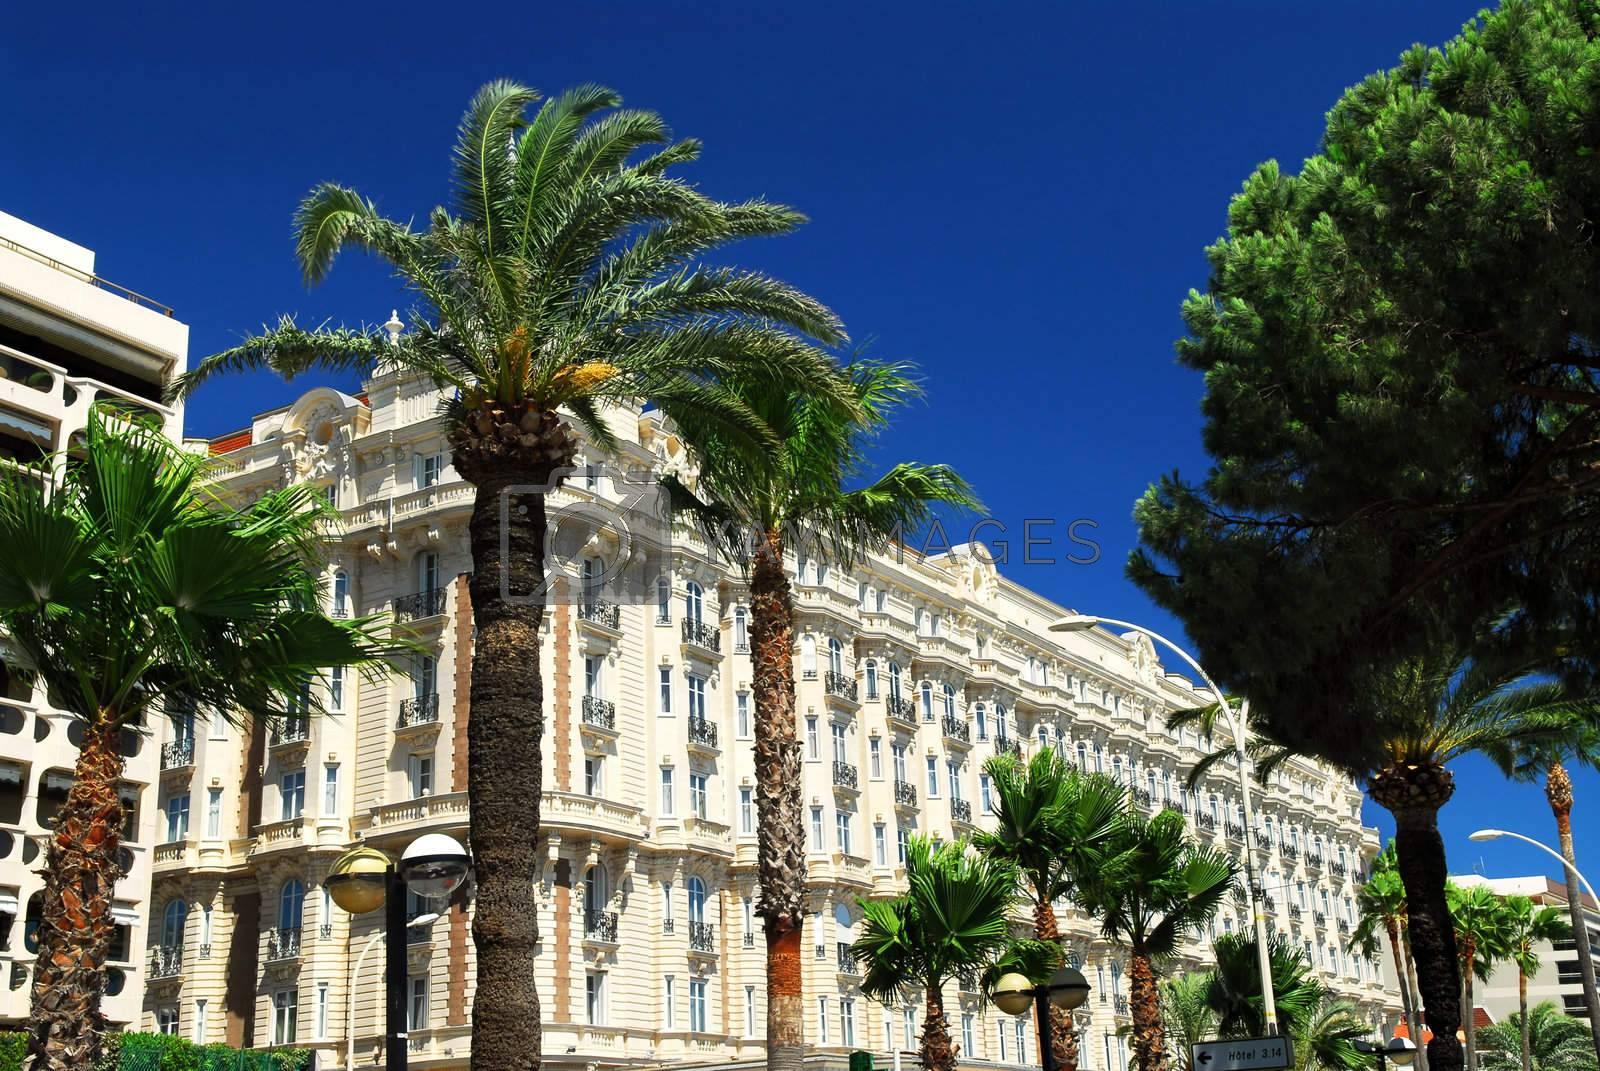 Luxury hotel on Croisette promenade in Cannes France